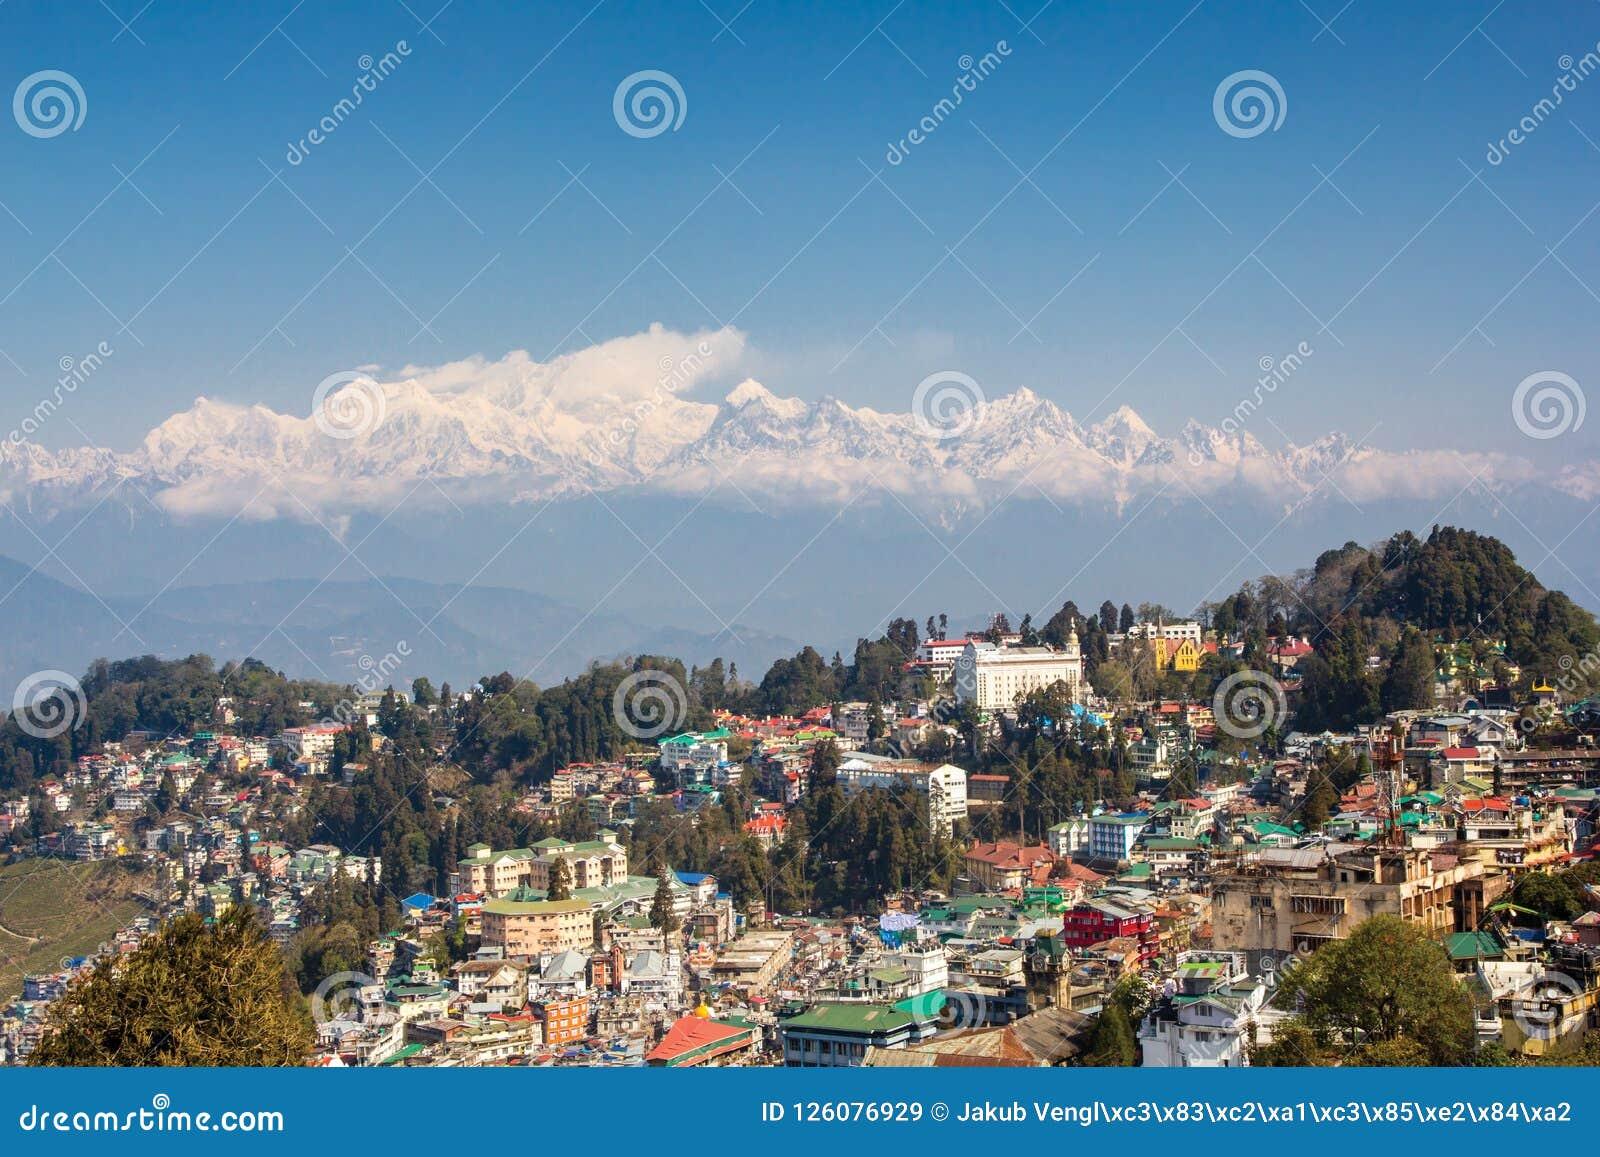 Darjeeling PDF Free Download